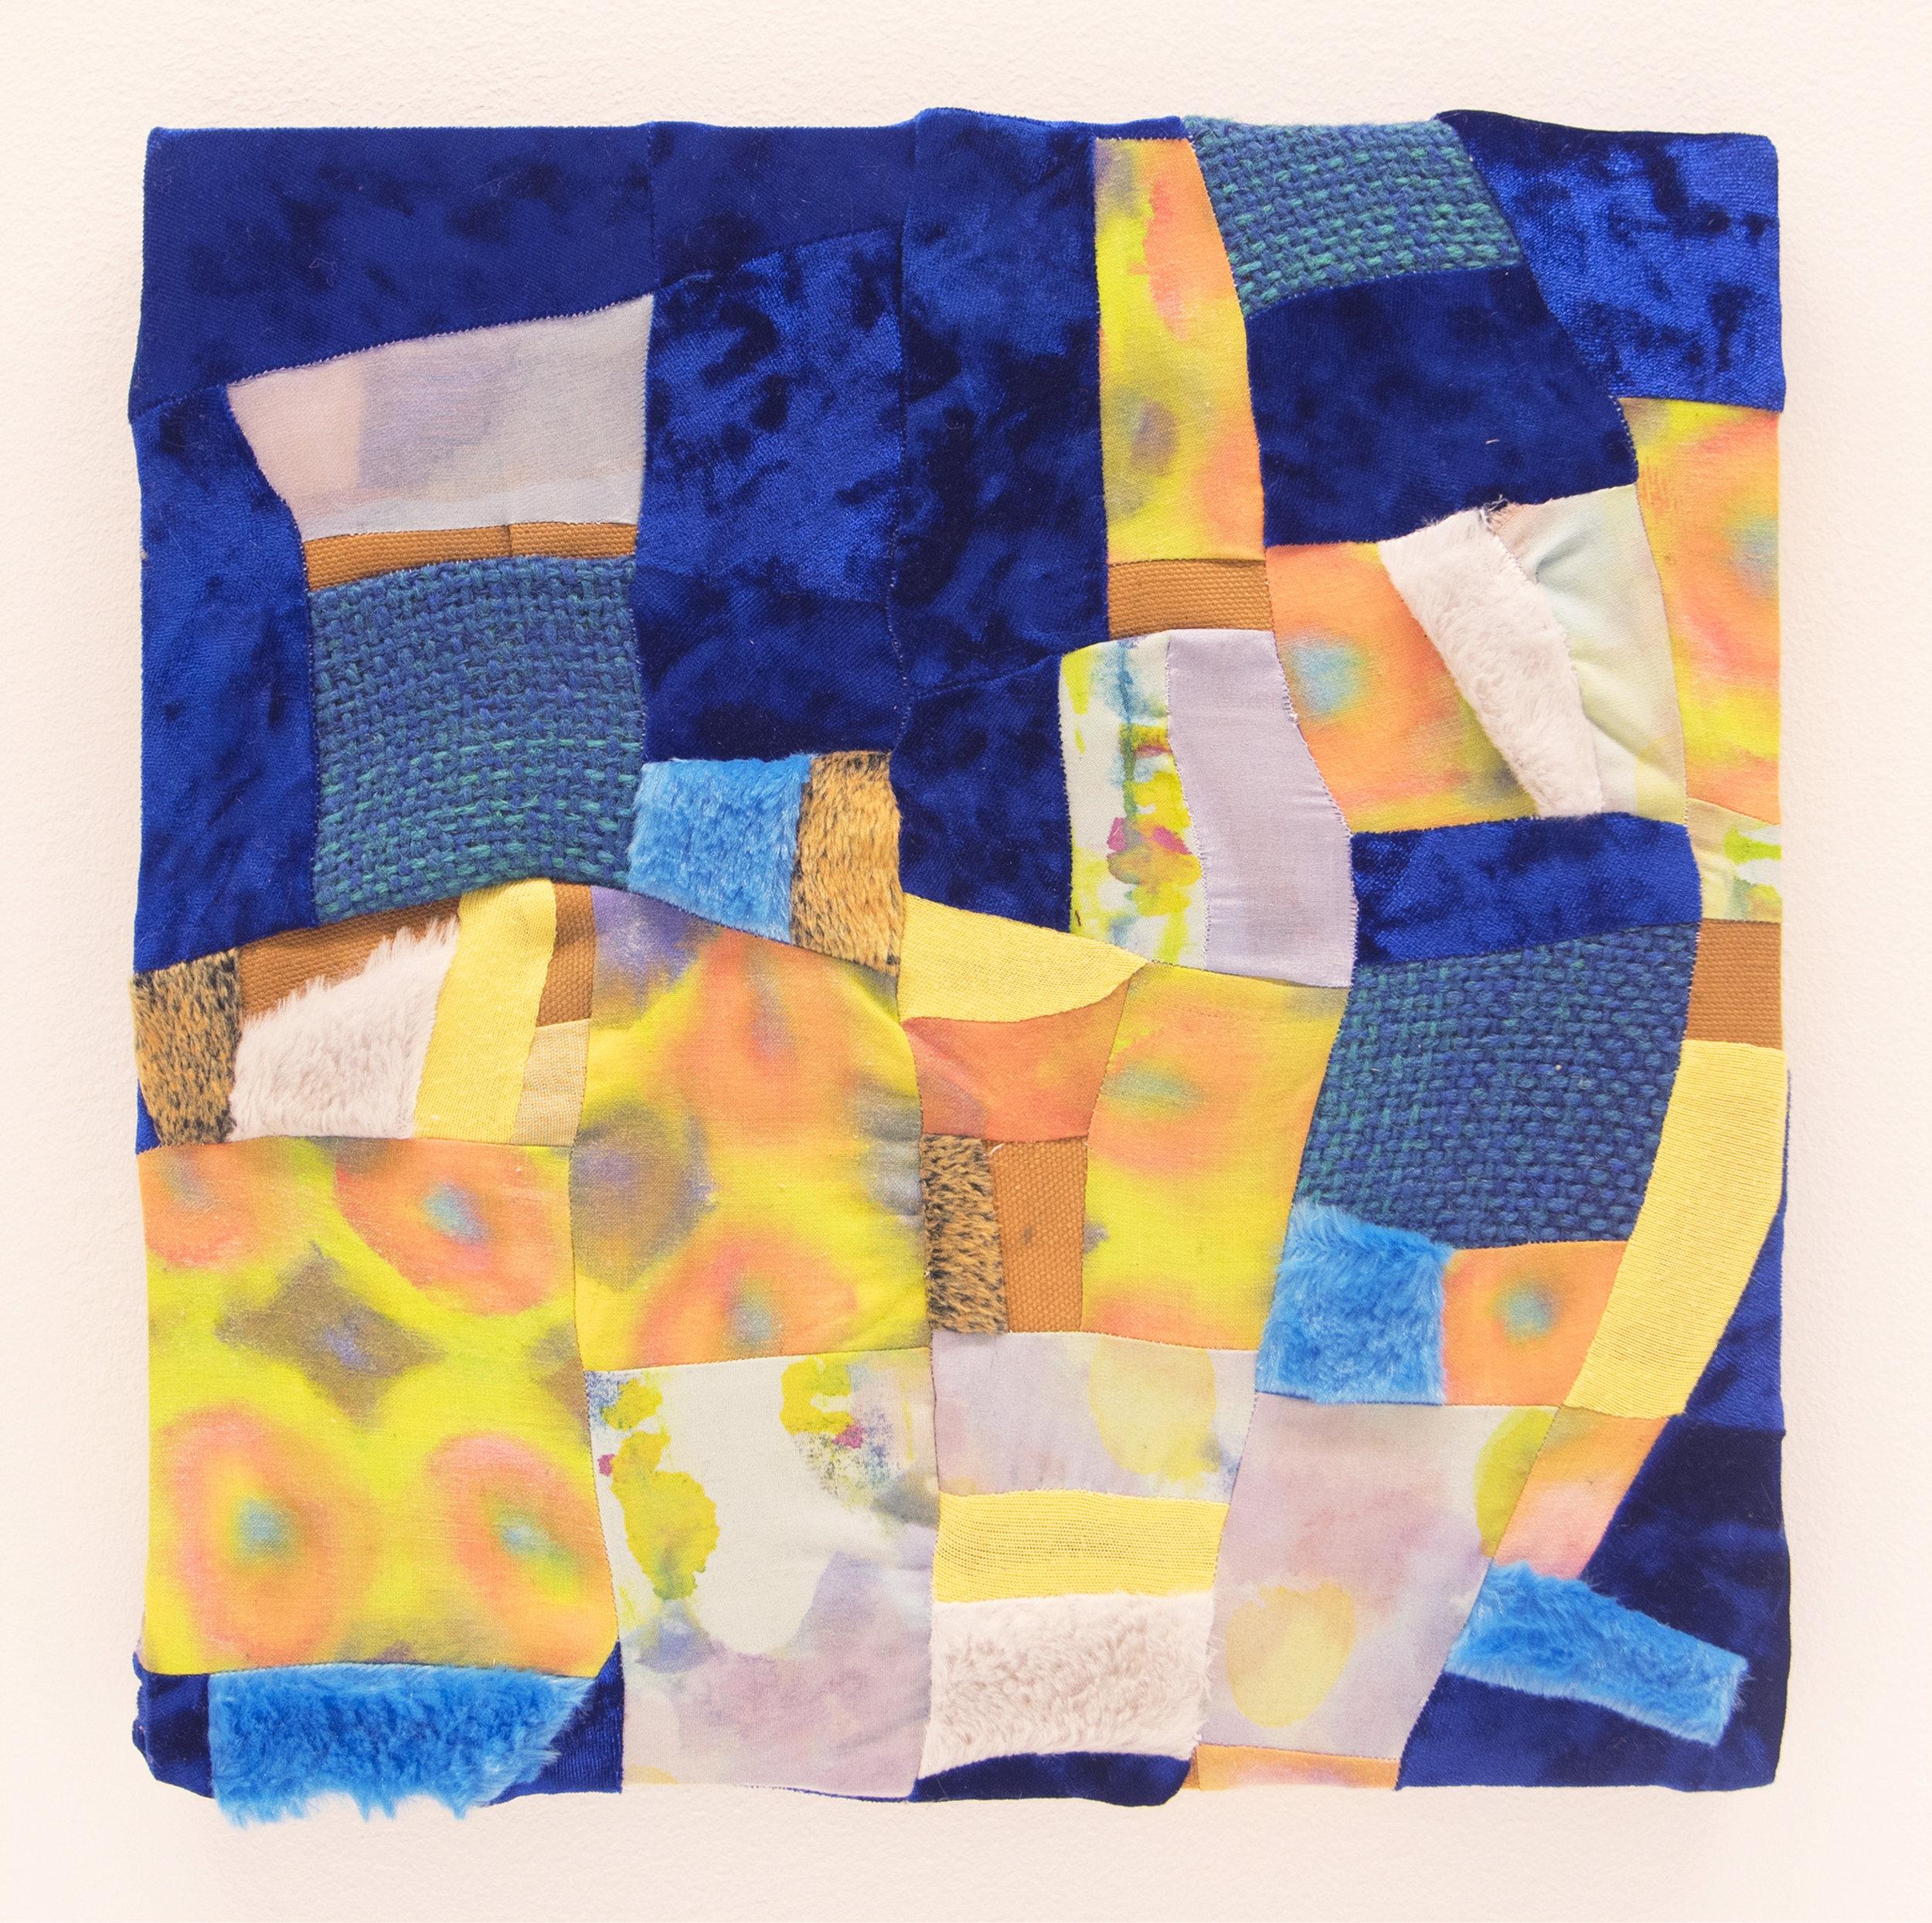 "Rumble   2017  Dye, green tea, fabric paint, cotton fabric, velour, faux fur, hand woven wool, canvas  12"" x 12"""